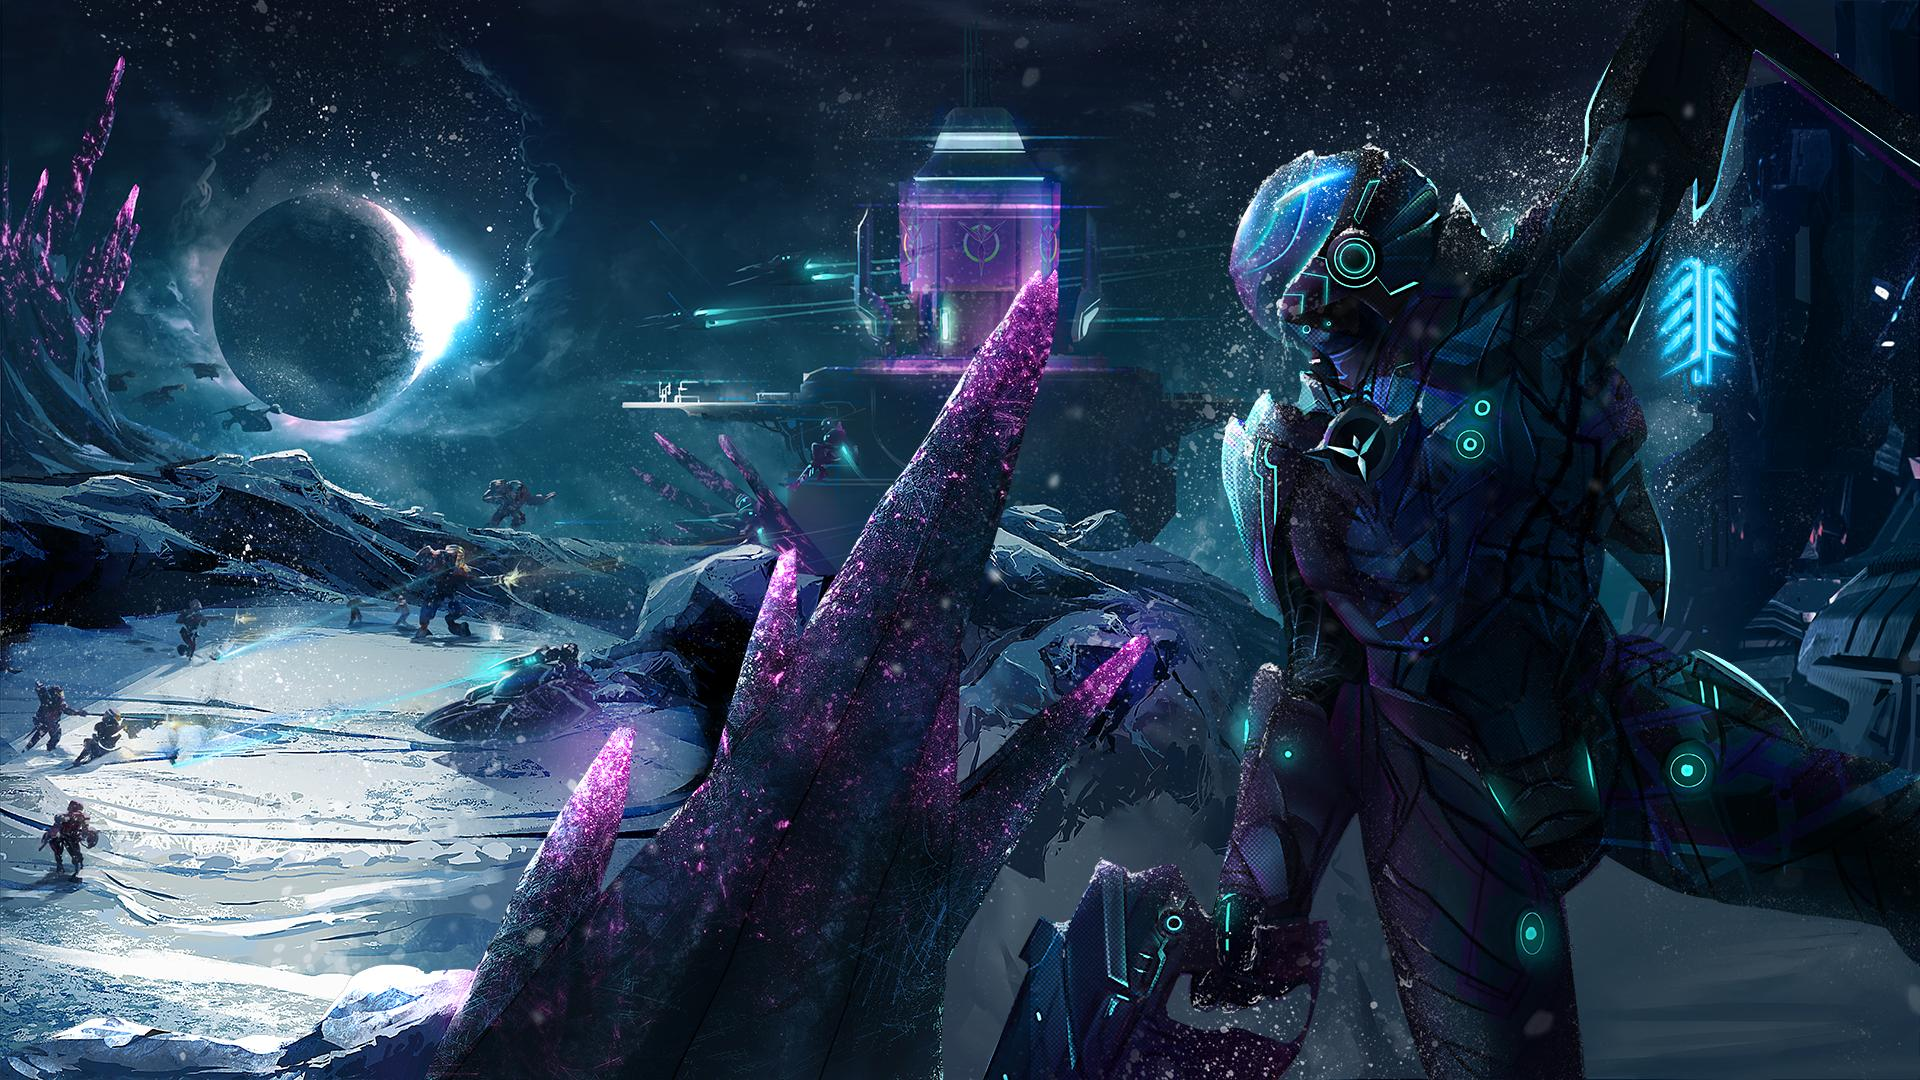 1080p Gaming Wallpapers Posted By John Mercado